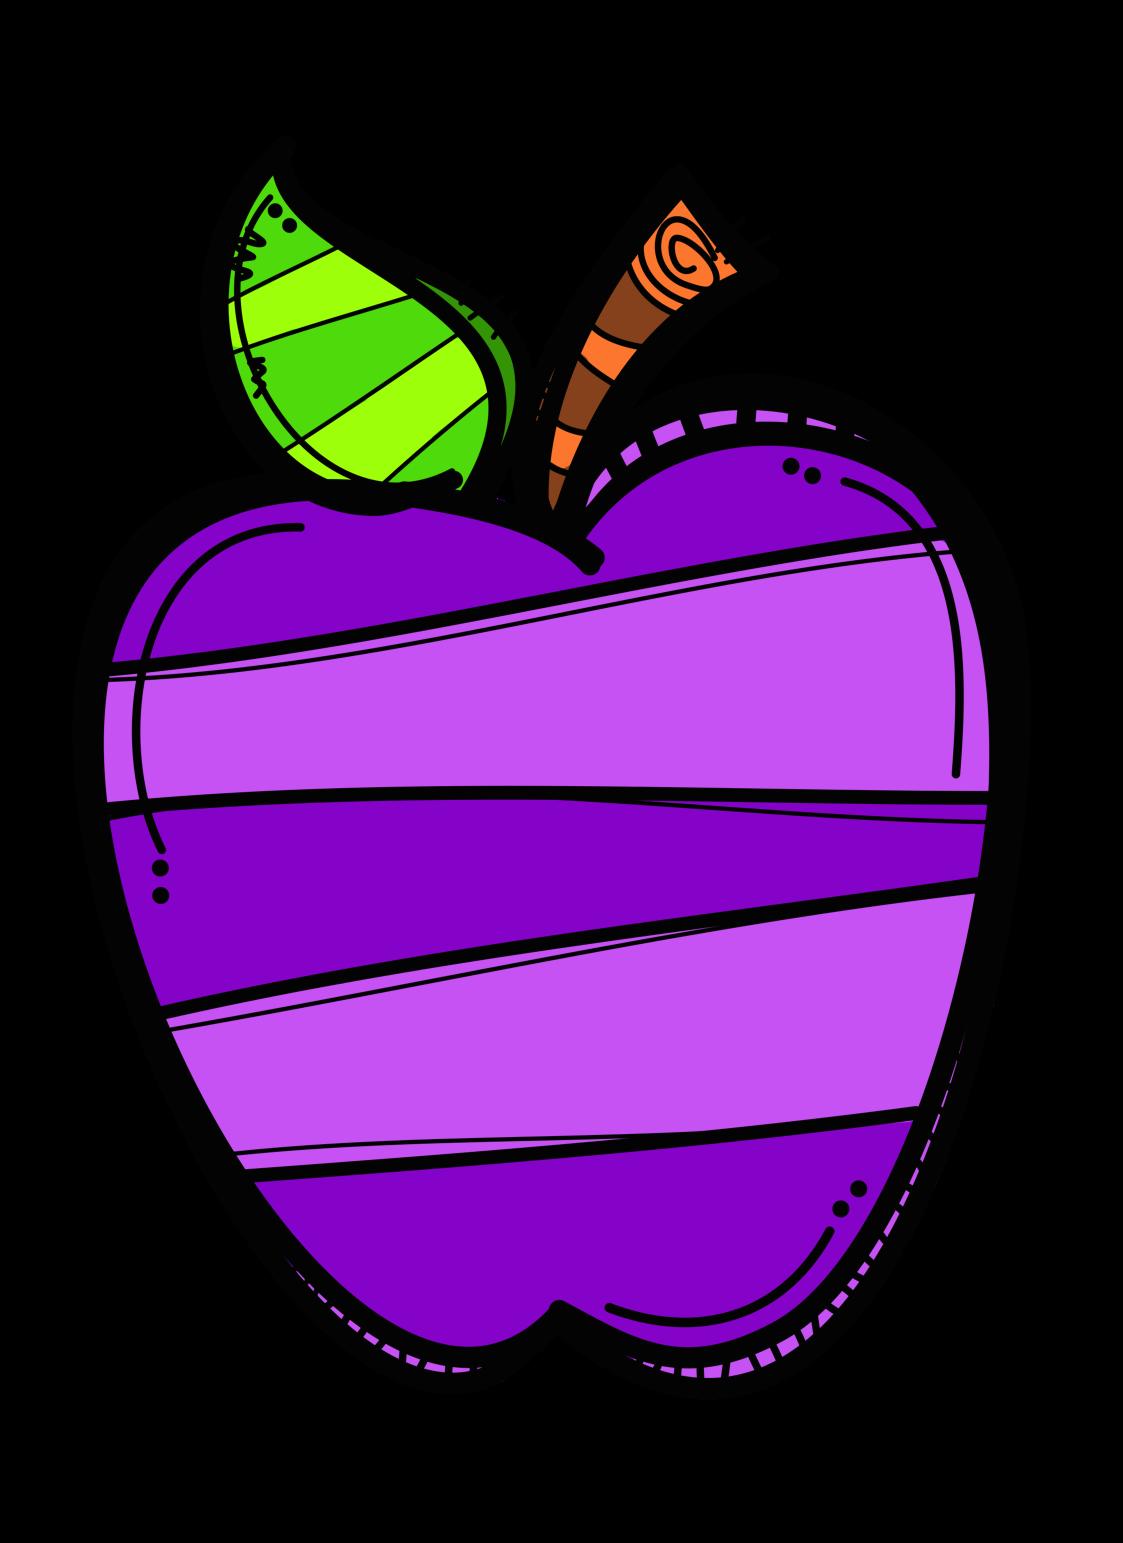 Apple clipart dj inkers library ✿*UY..QUE TE COMO*✿* | MELONHEADZ | Pinterest | Clip art, Dj ... library